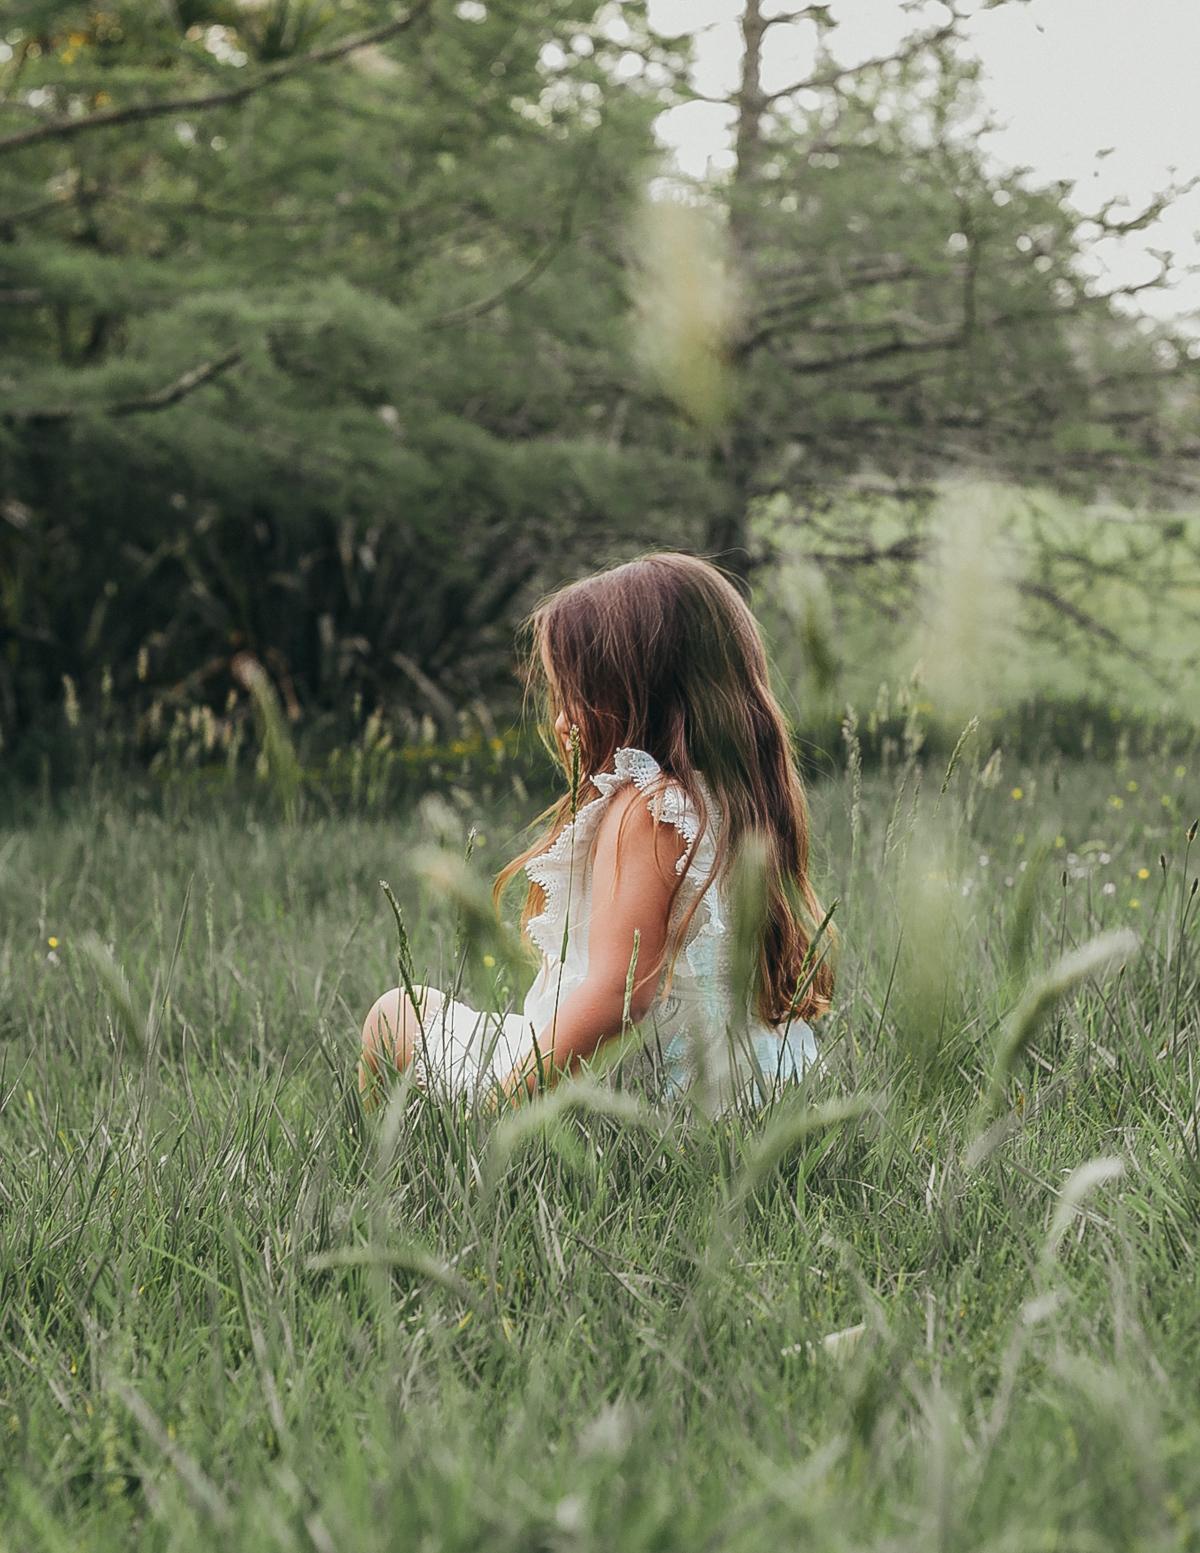 Karibou Kids: Little Angel Cotton and Lace Dress - White 4YRS image